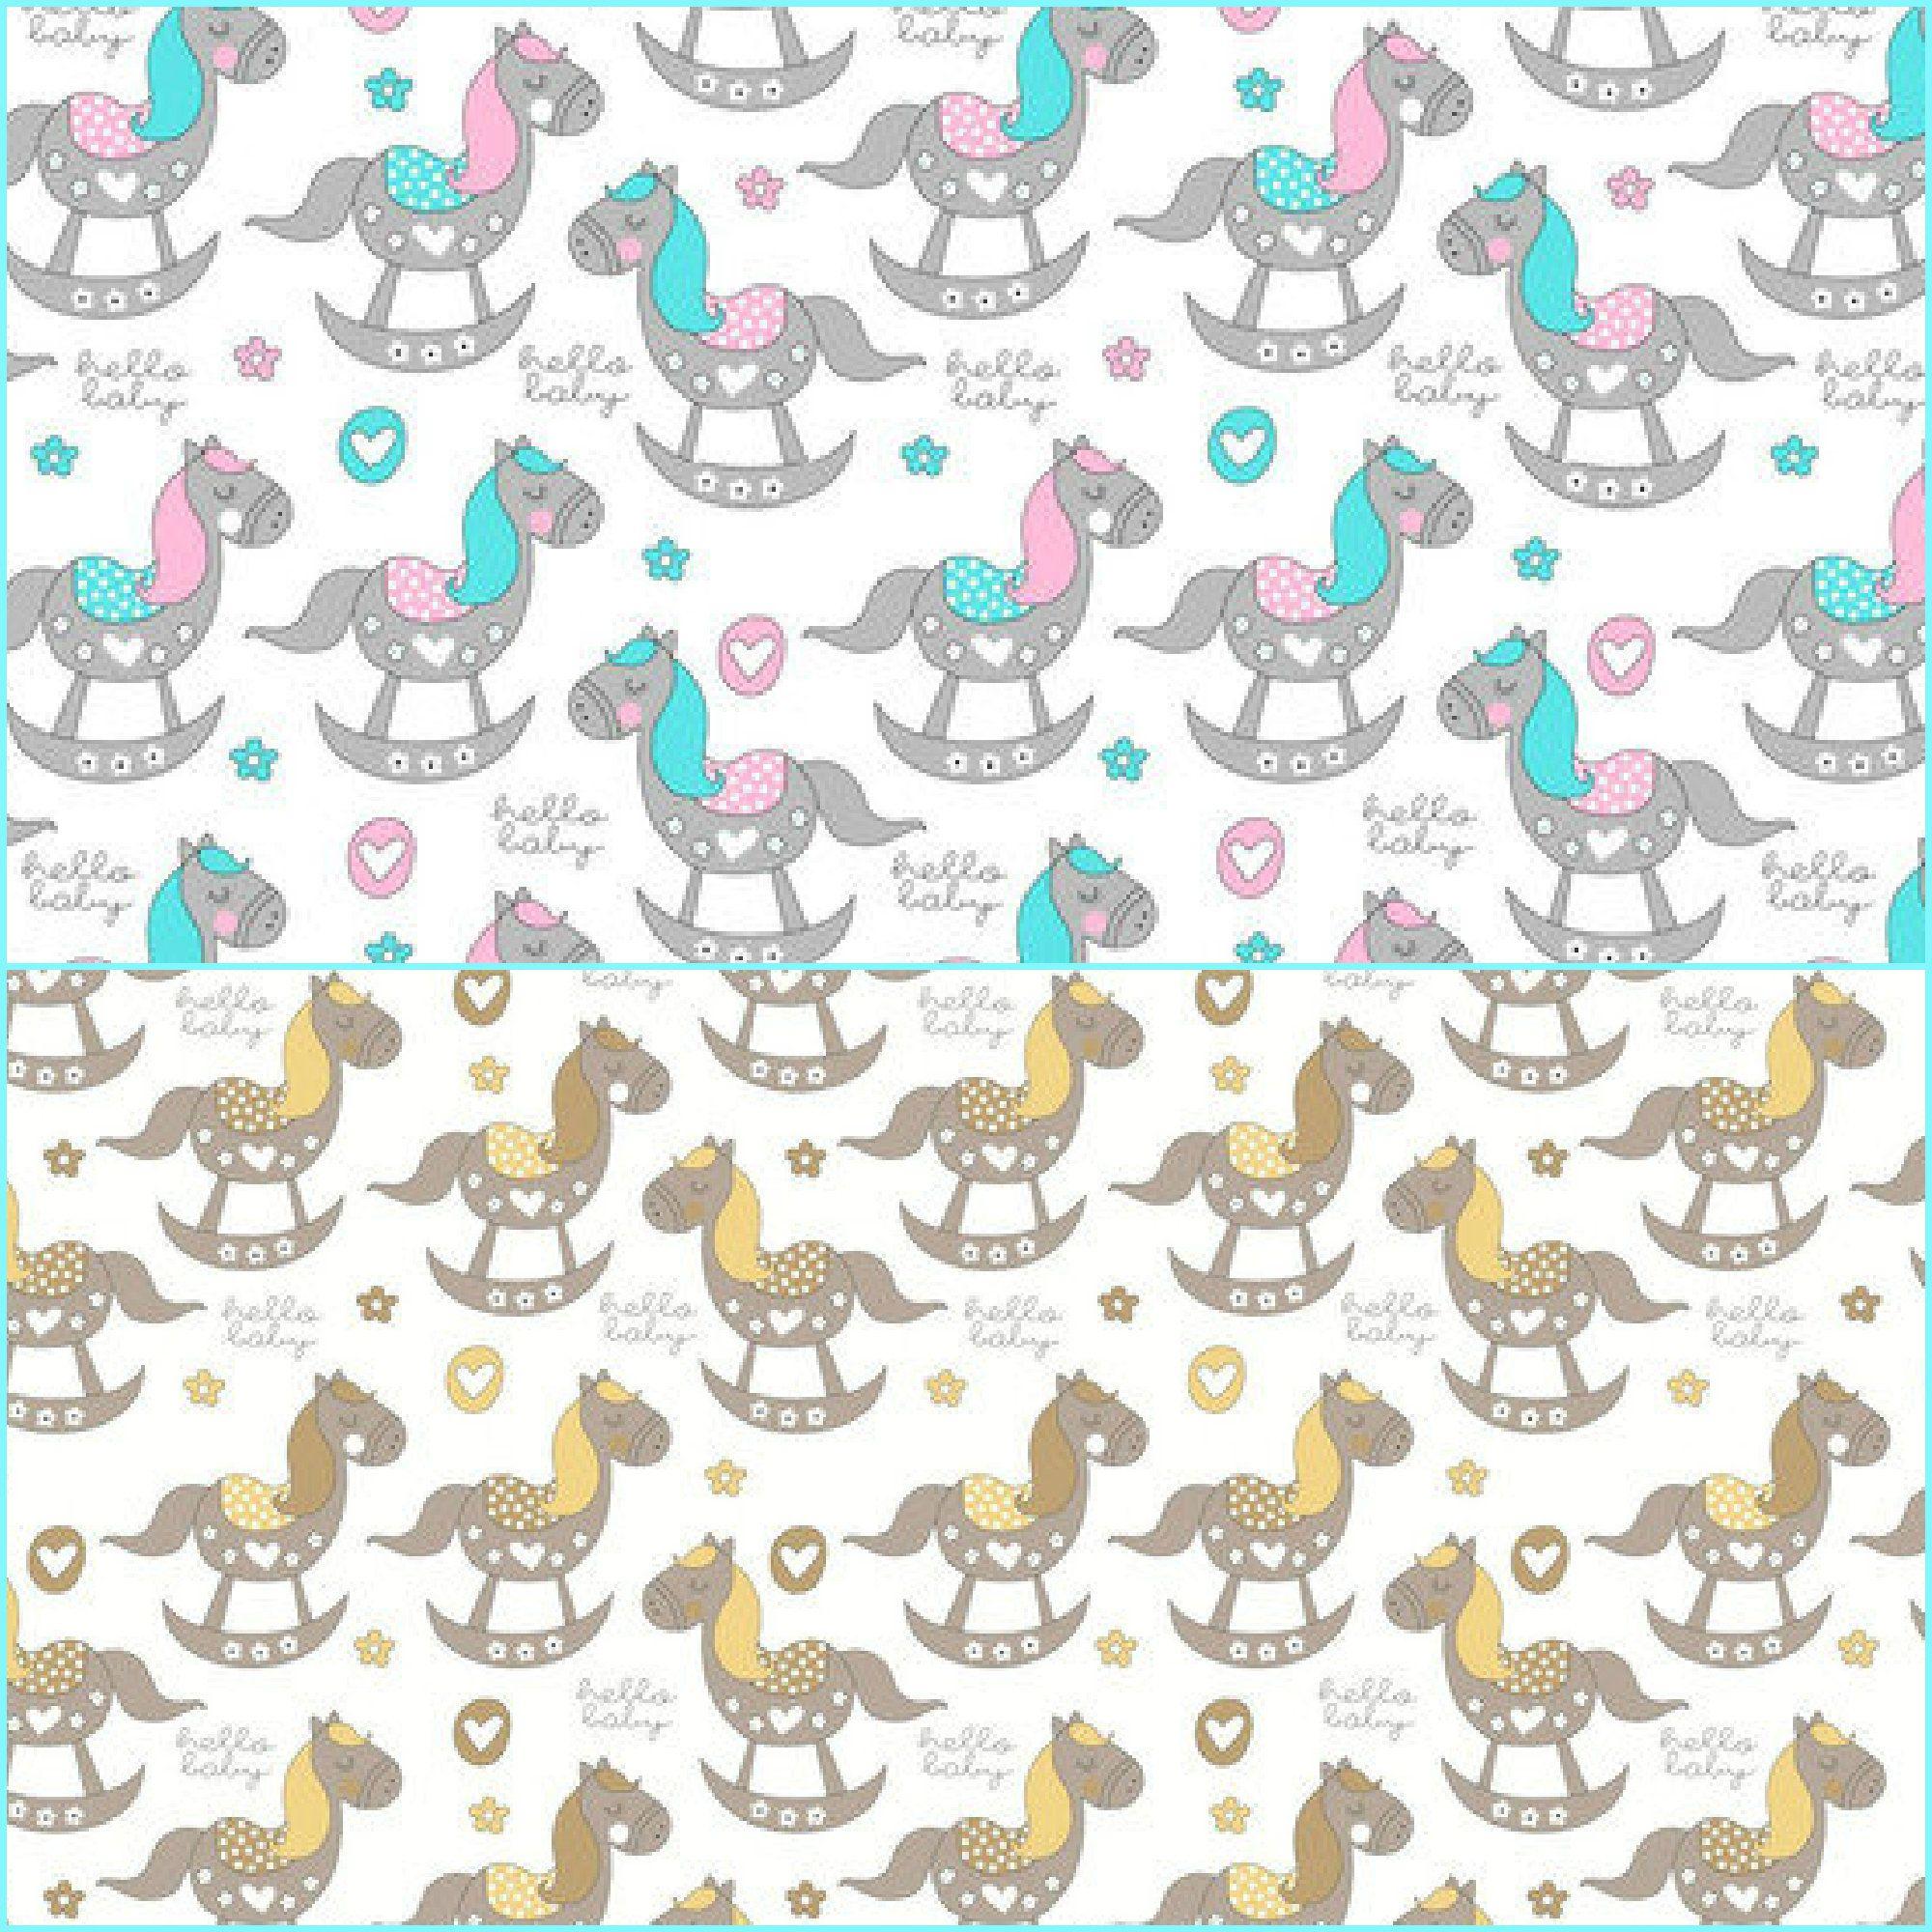 Horse Cotton Fabric By The Yard Little Pony Baby Nursery Newborn Tissue Bedding